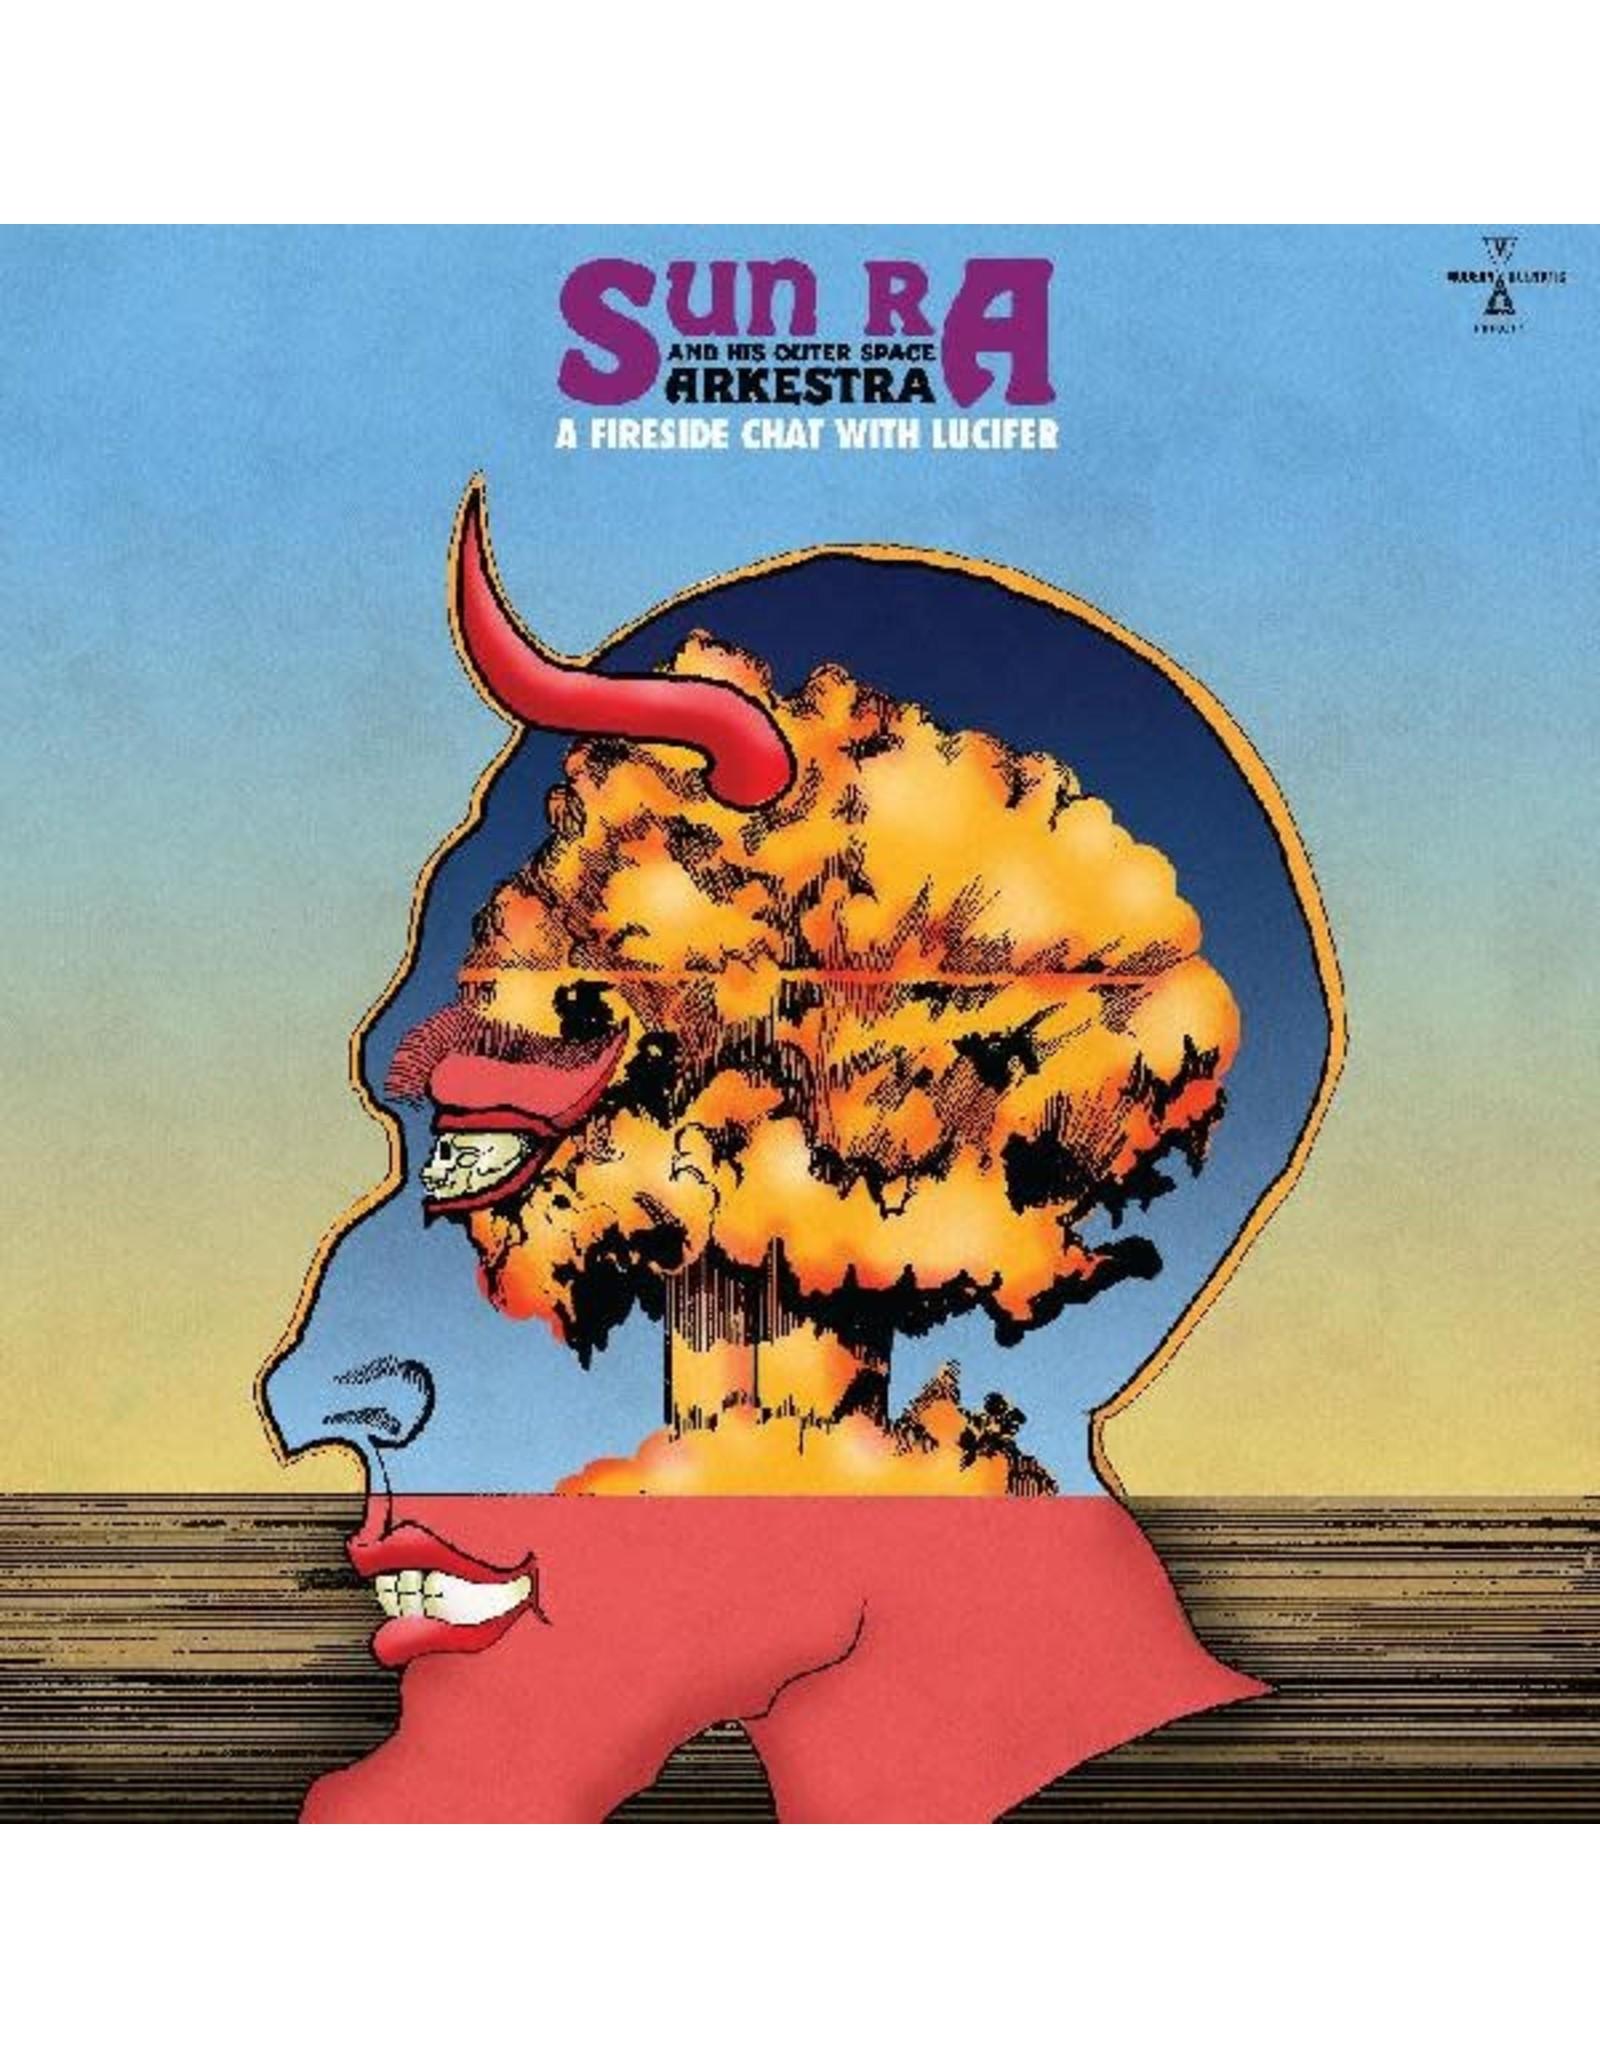 New Vinyl Sun Ra - A Fireside Chat With Lucifer LP